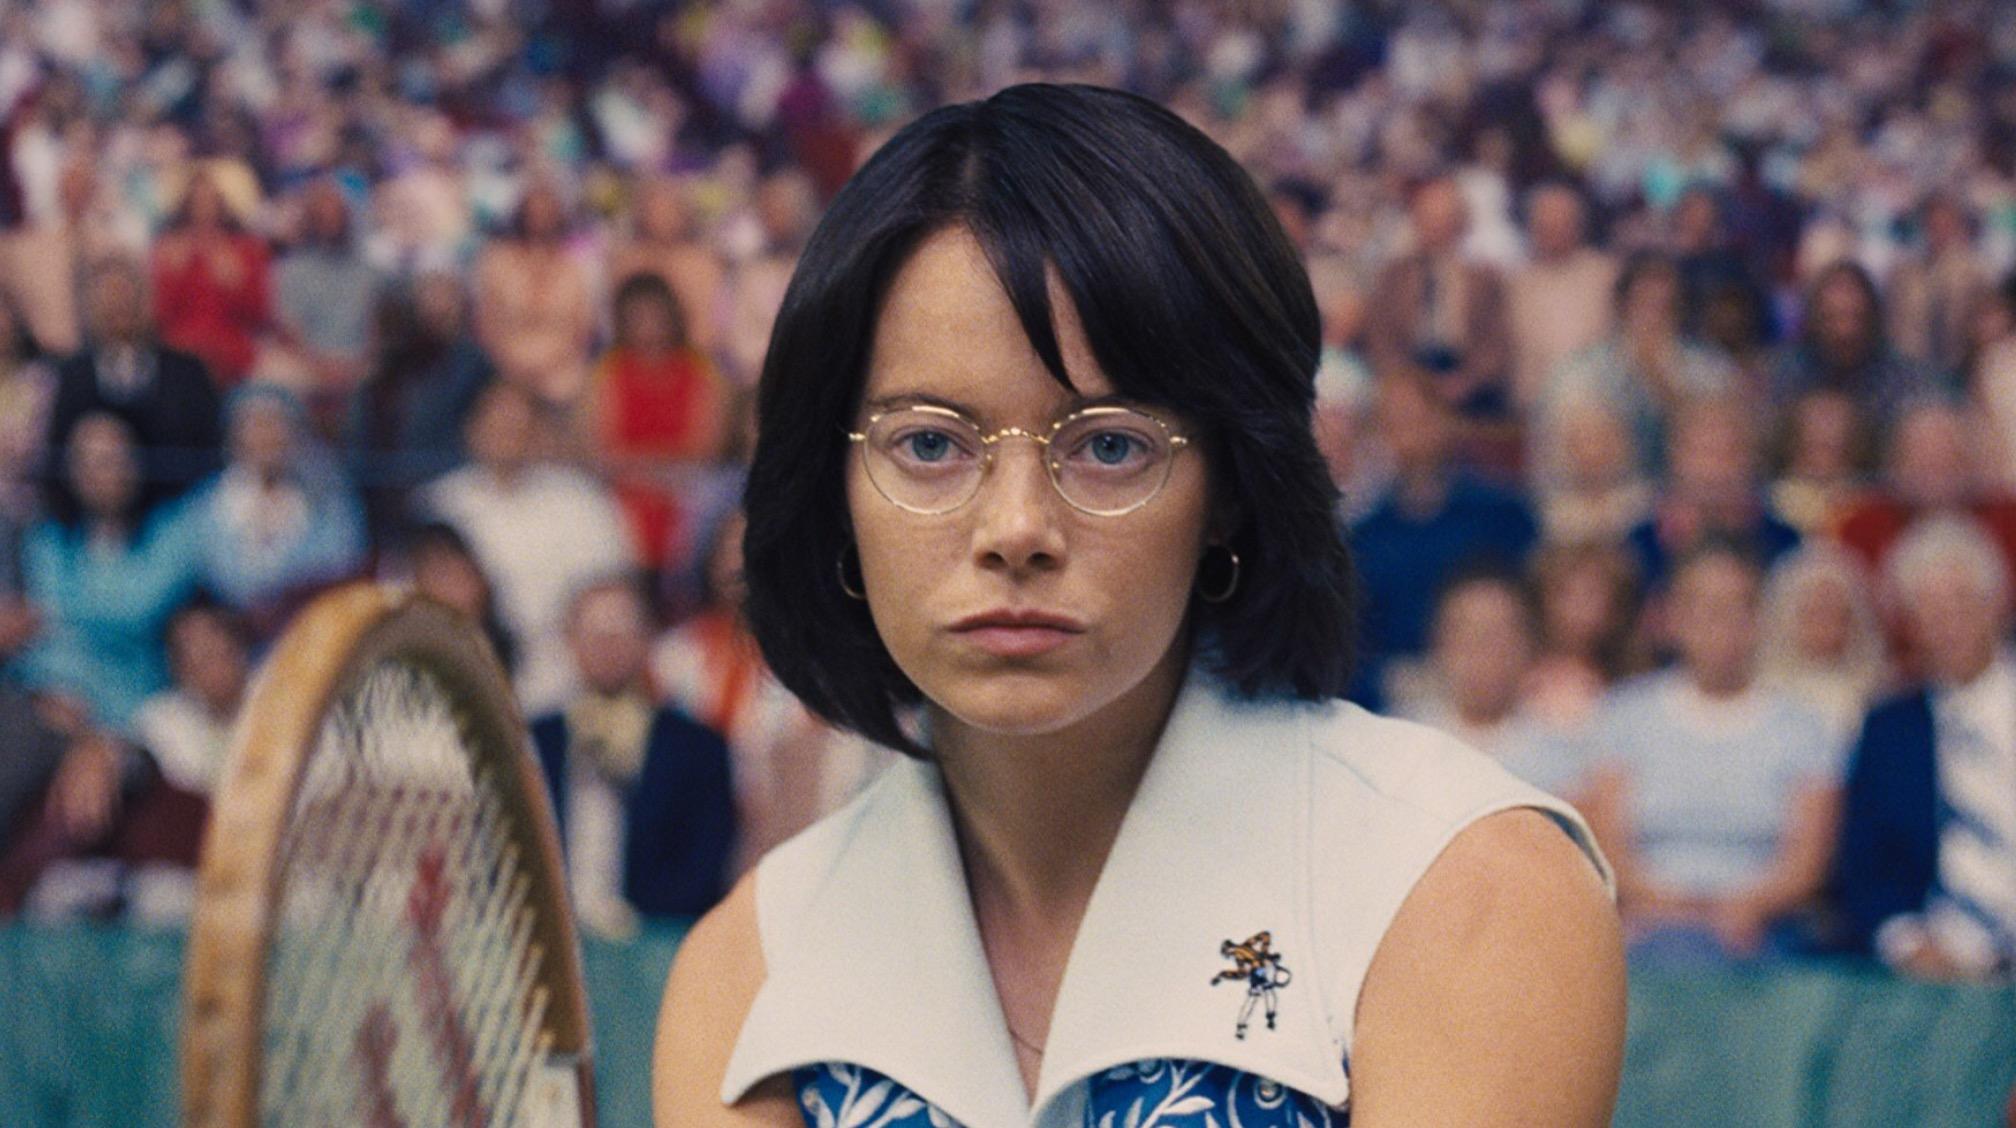 Emma Stone as Billie Jean King in Battle of the Sexes